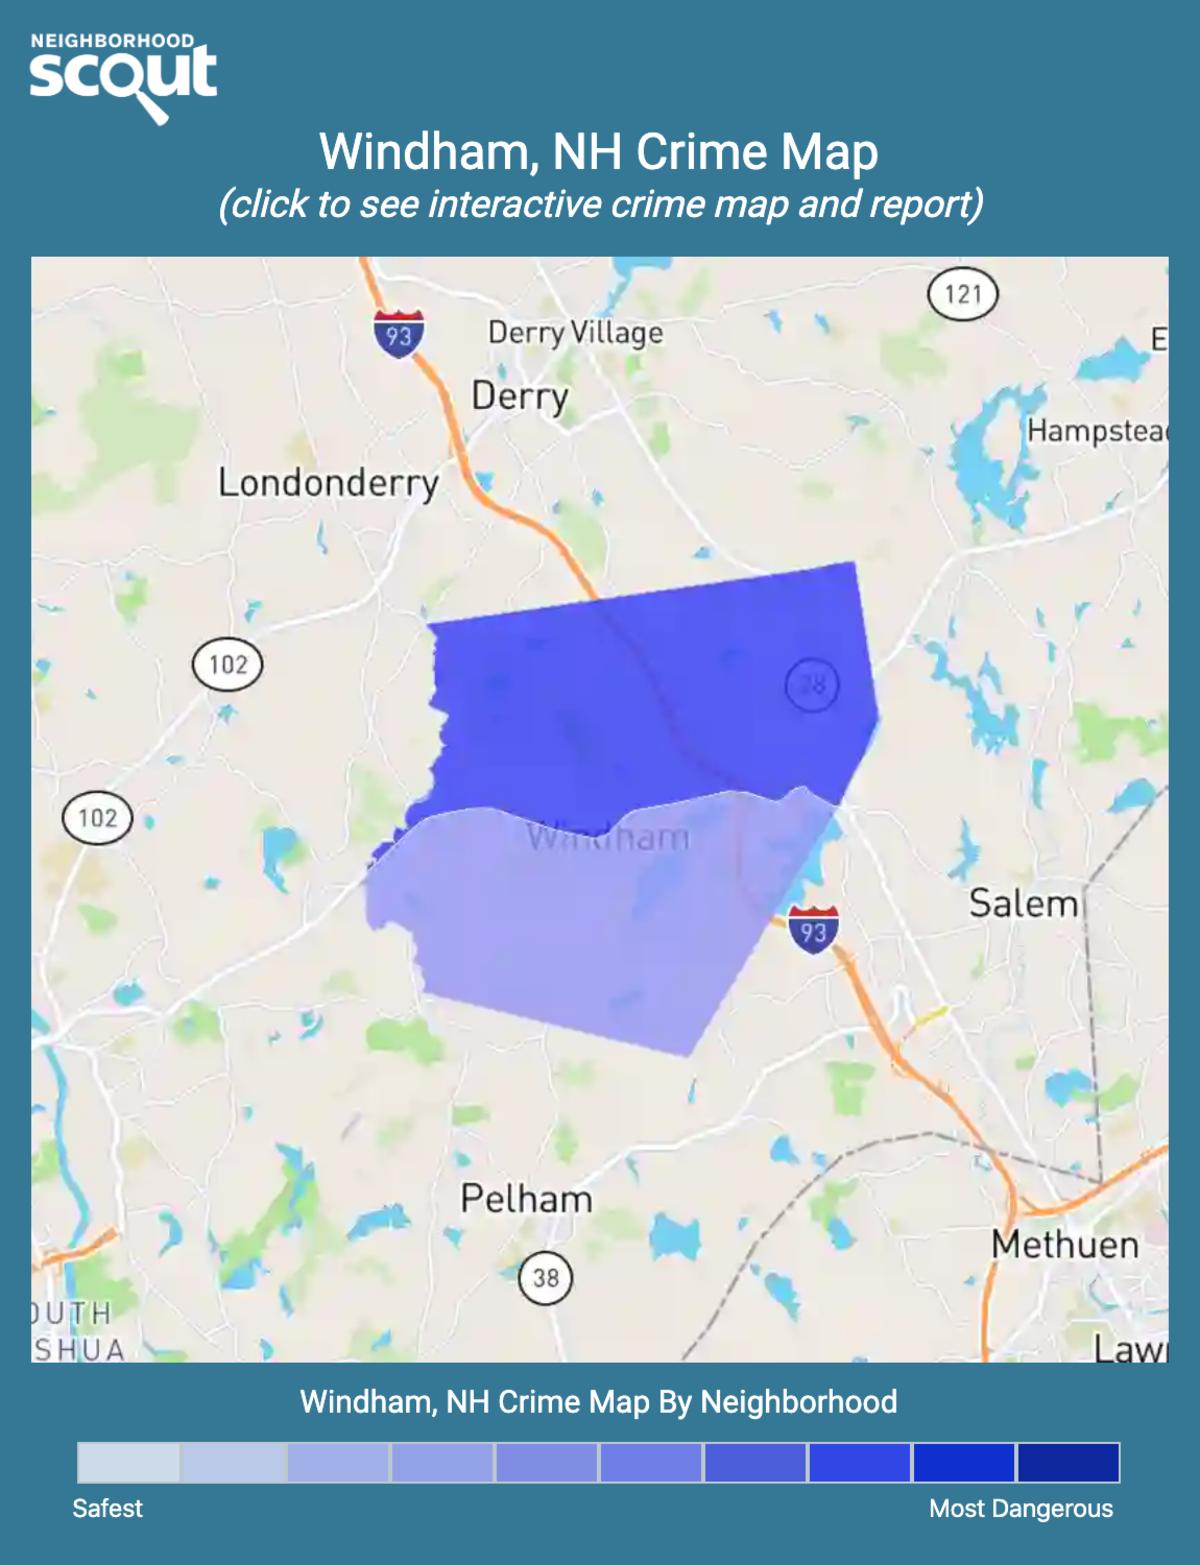 Windham, New Hampshire crime map